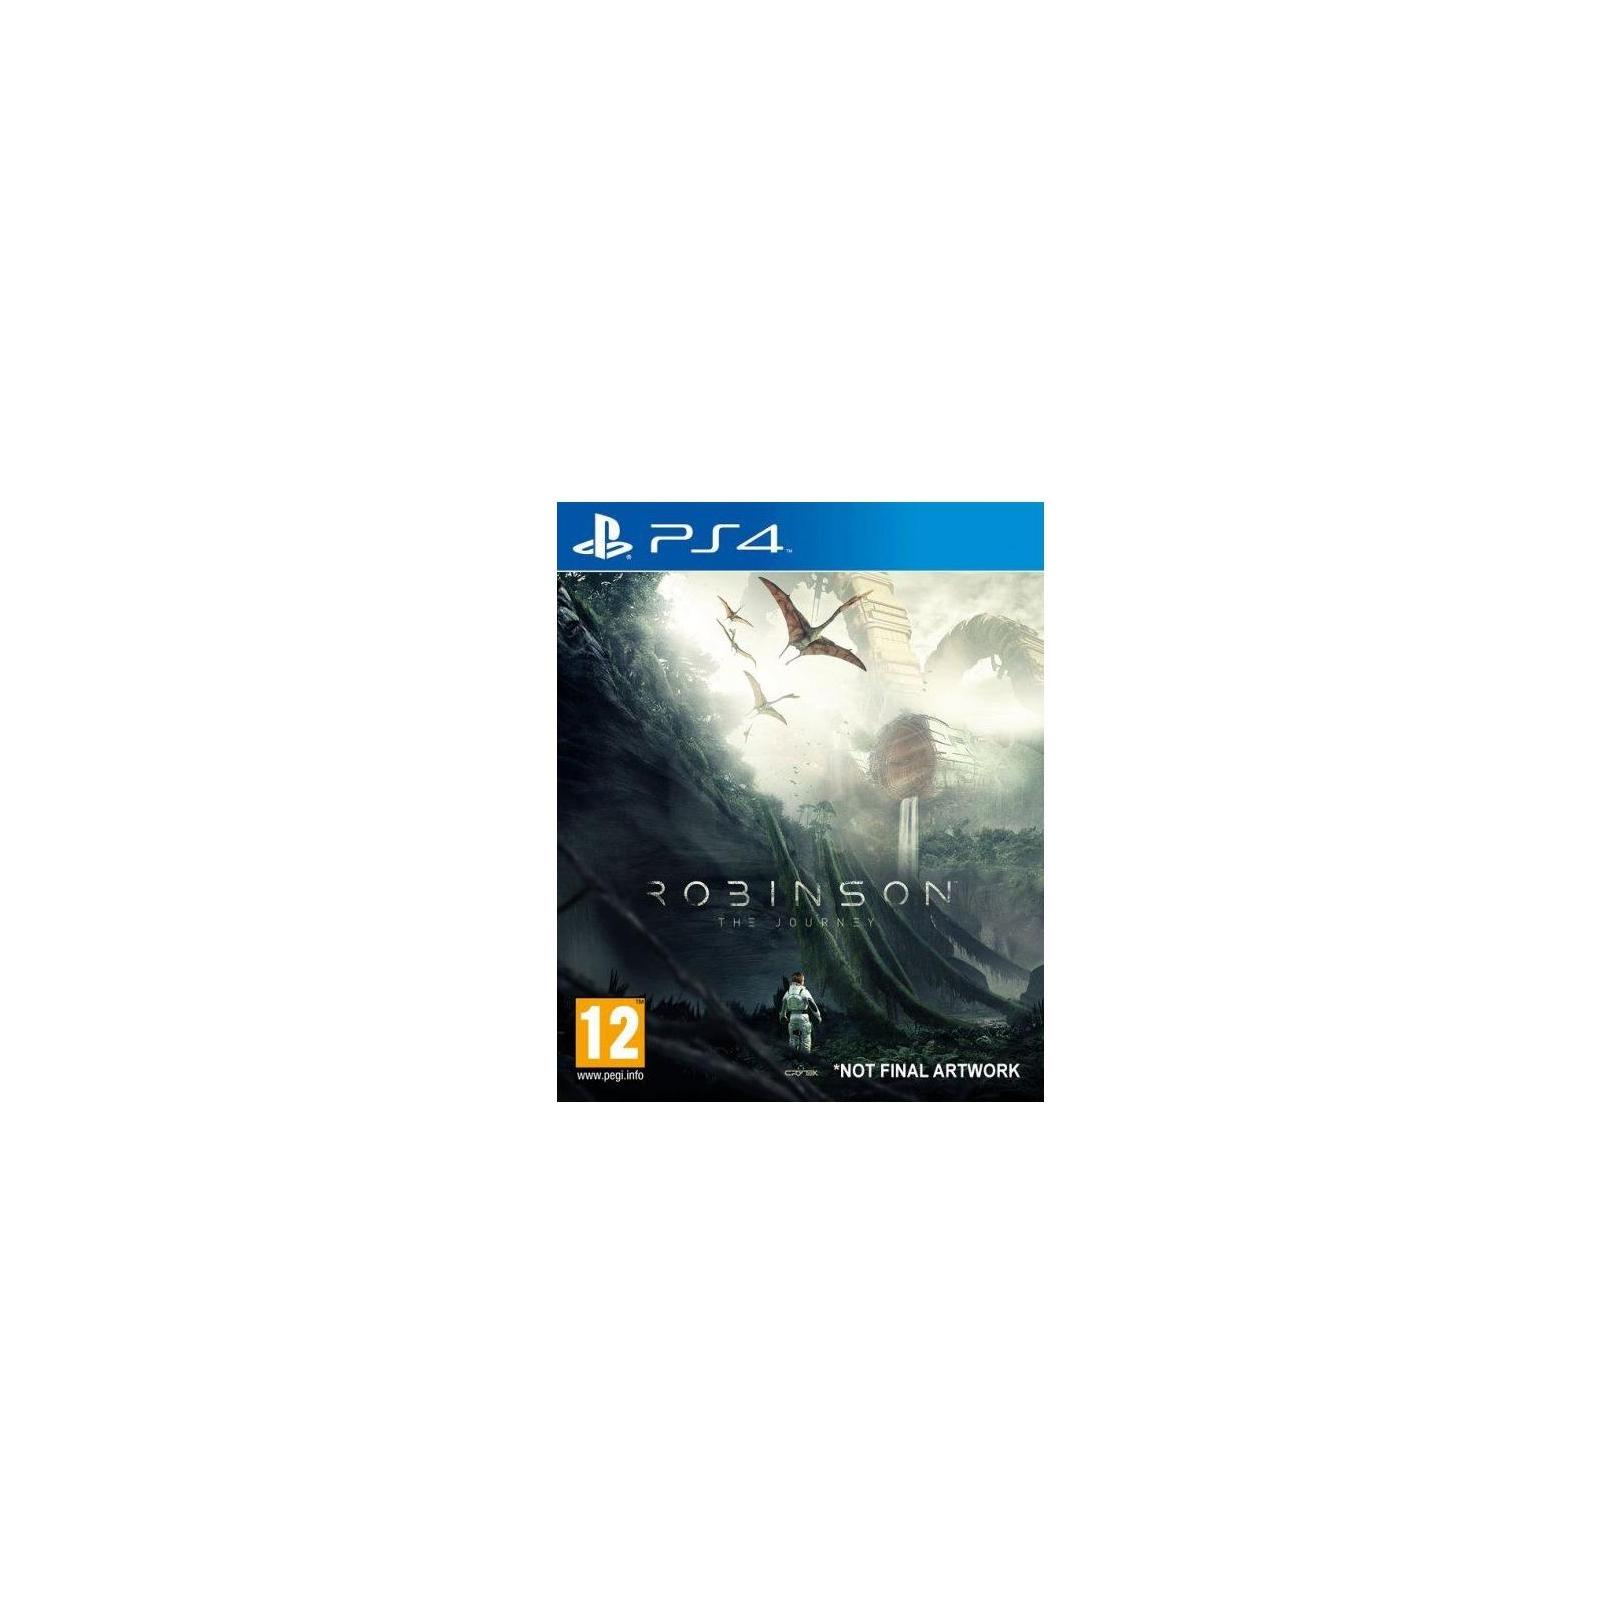 Игра SONY Robinson. The Journey (только для VR) [PS4] (9773610)